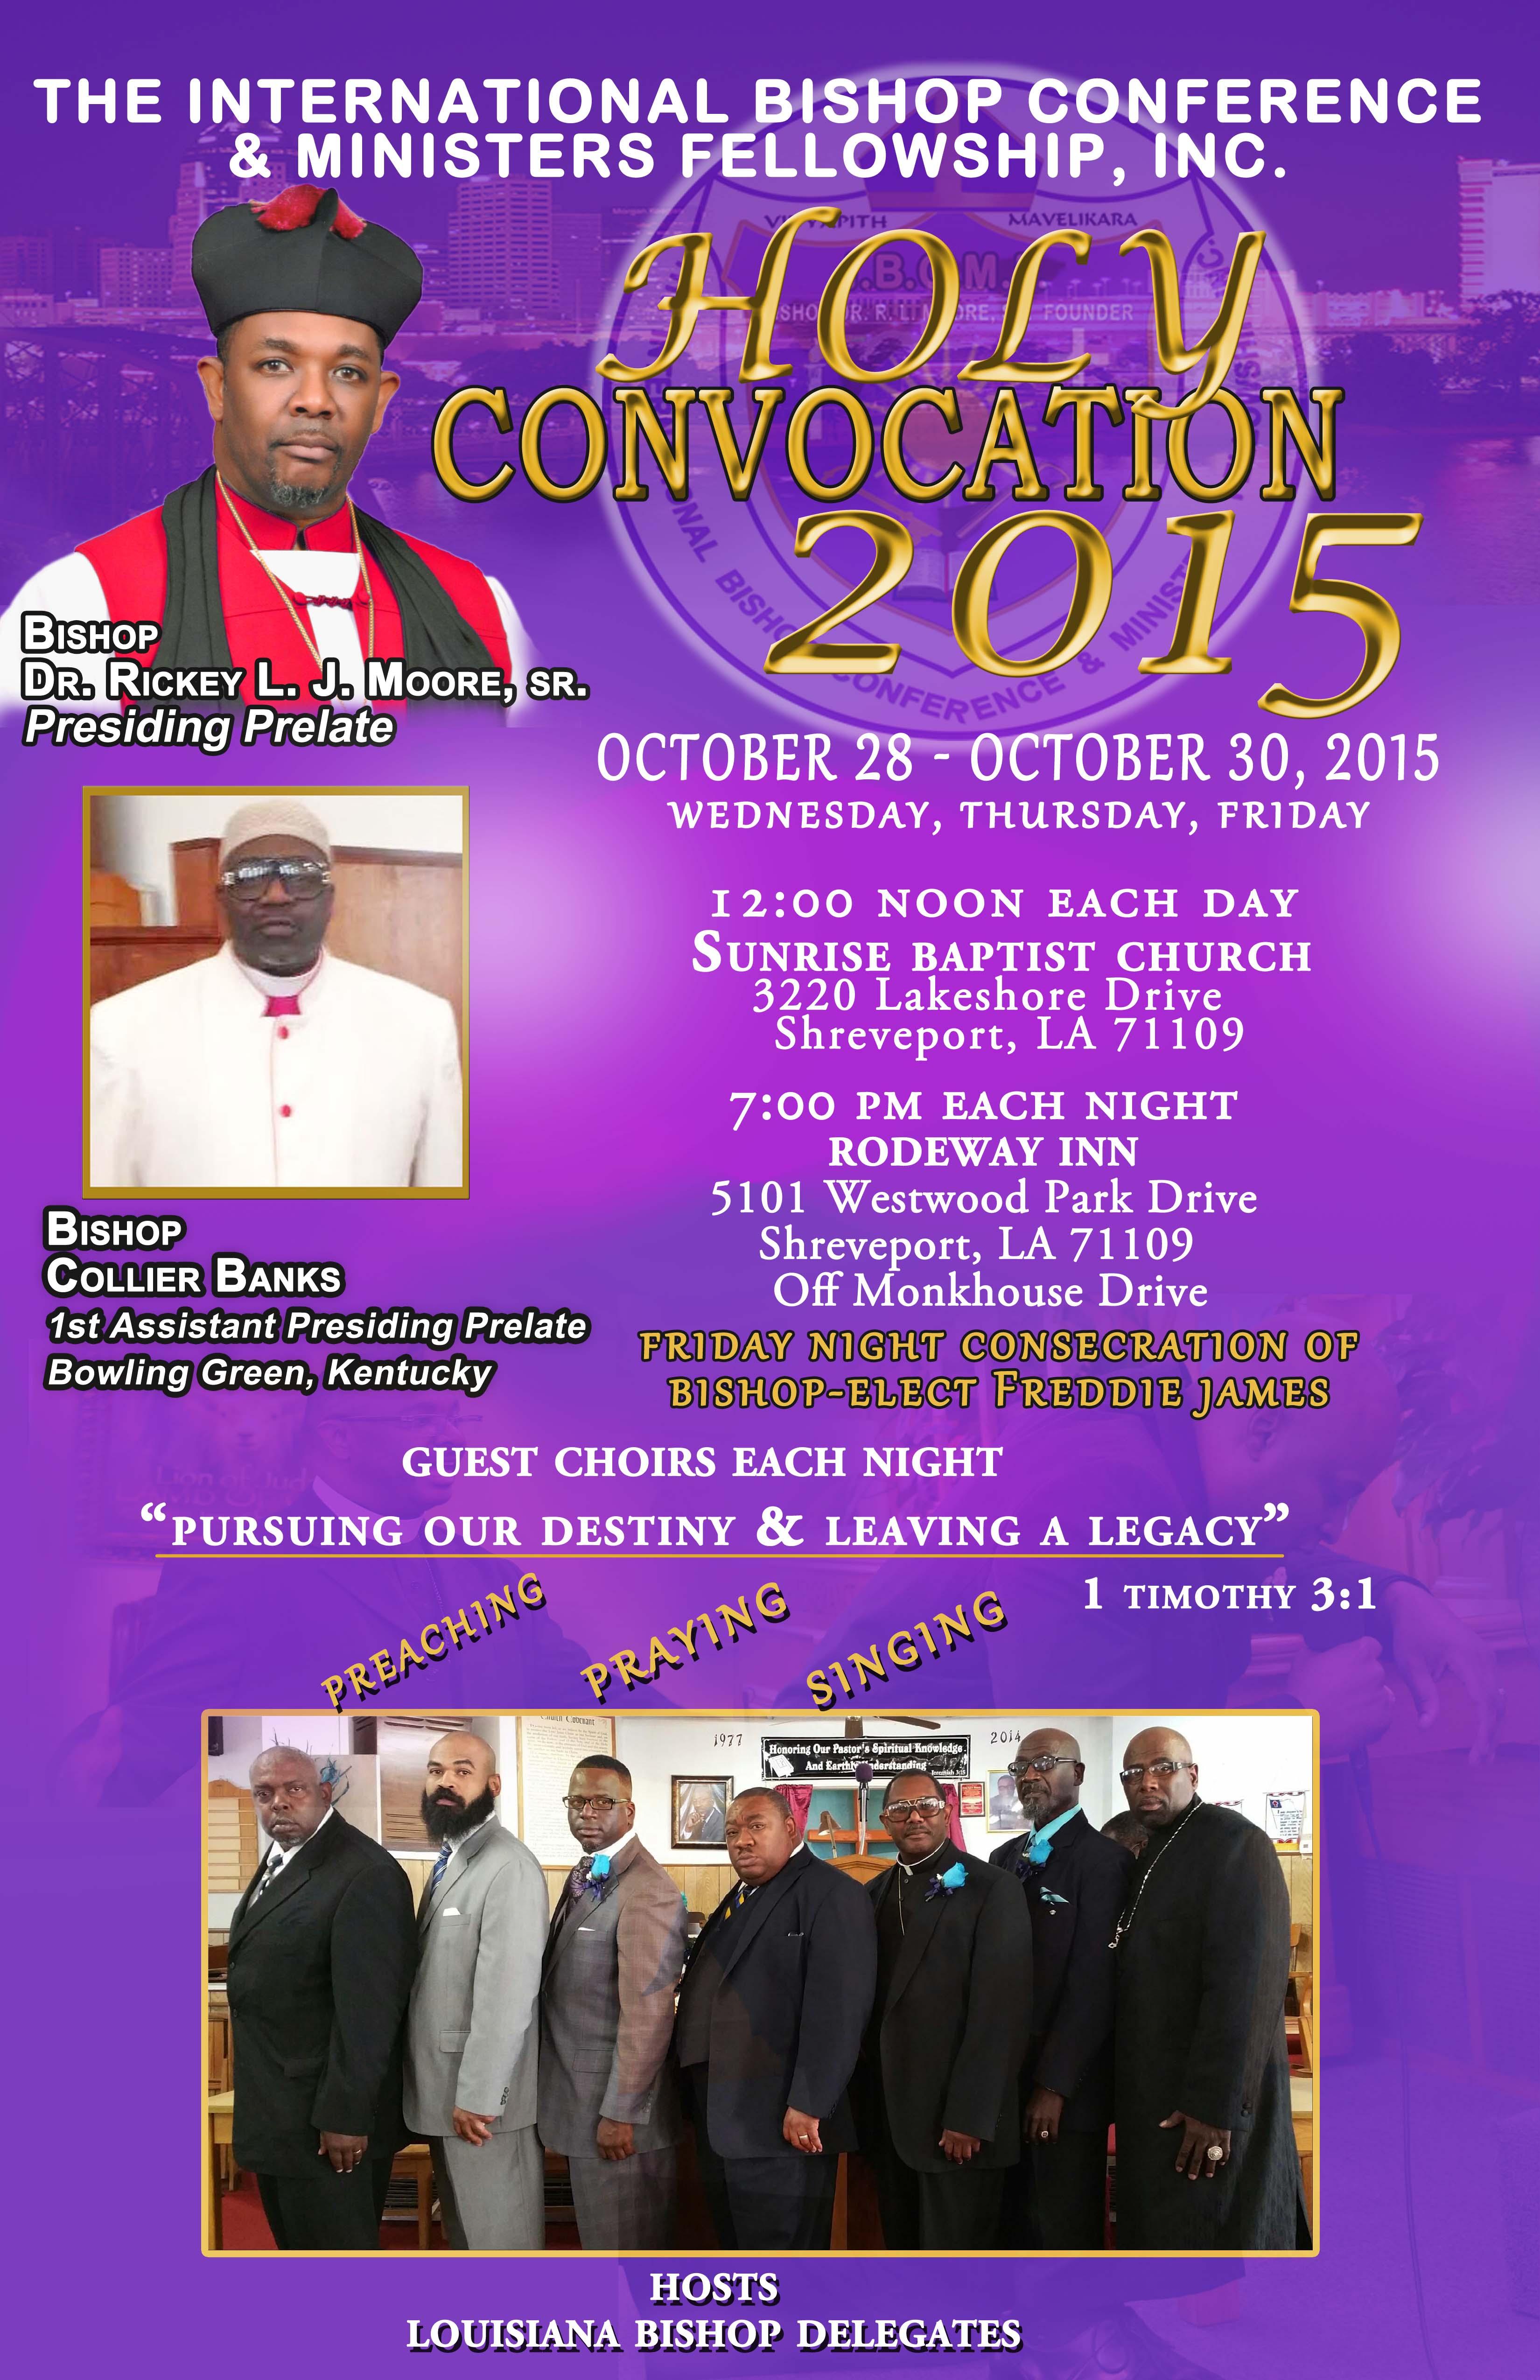 holy convocation 2015